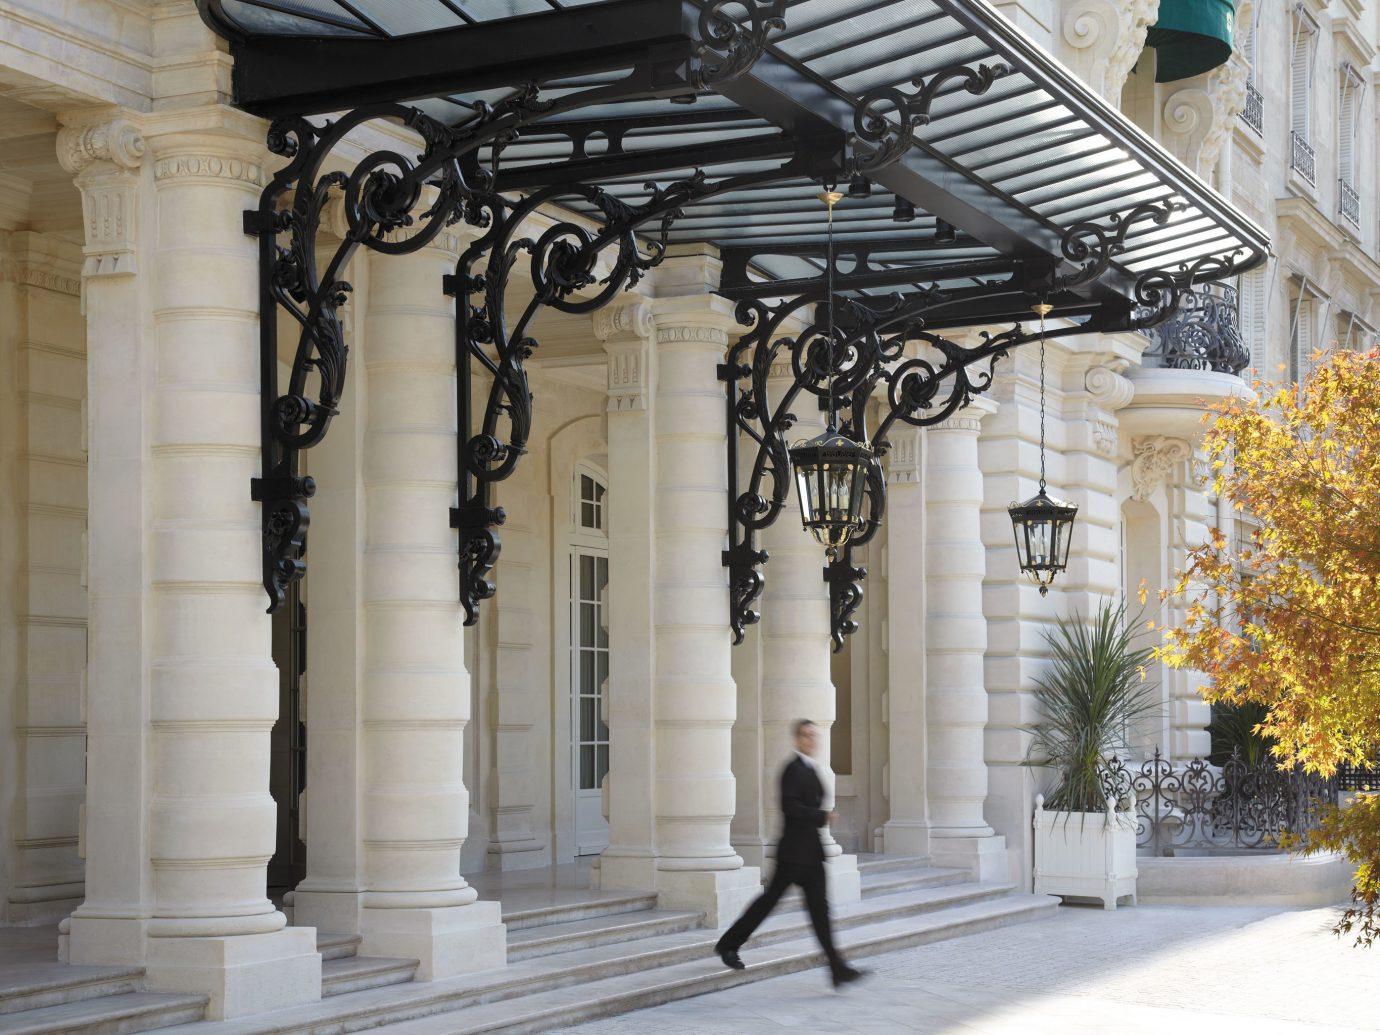 Elegant Exterior Hotels Scenic views Style + Design building outdoor column structure Architecture baluster art sculpture arch tourist attraction statue monument colonnade